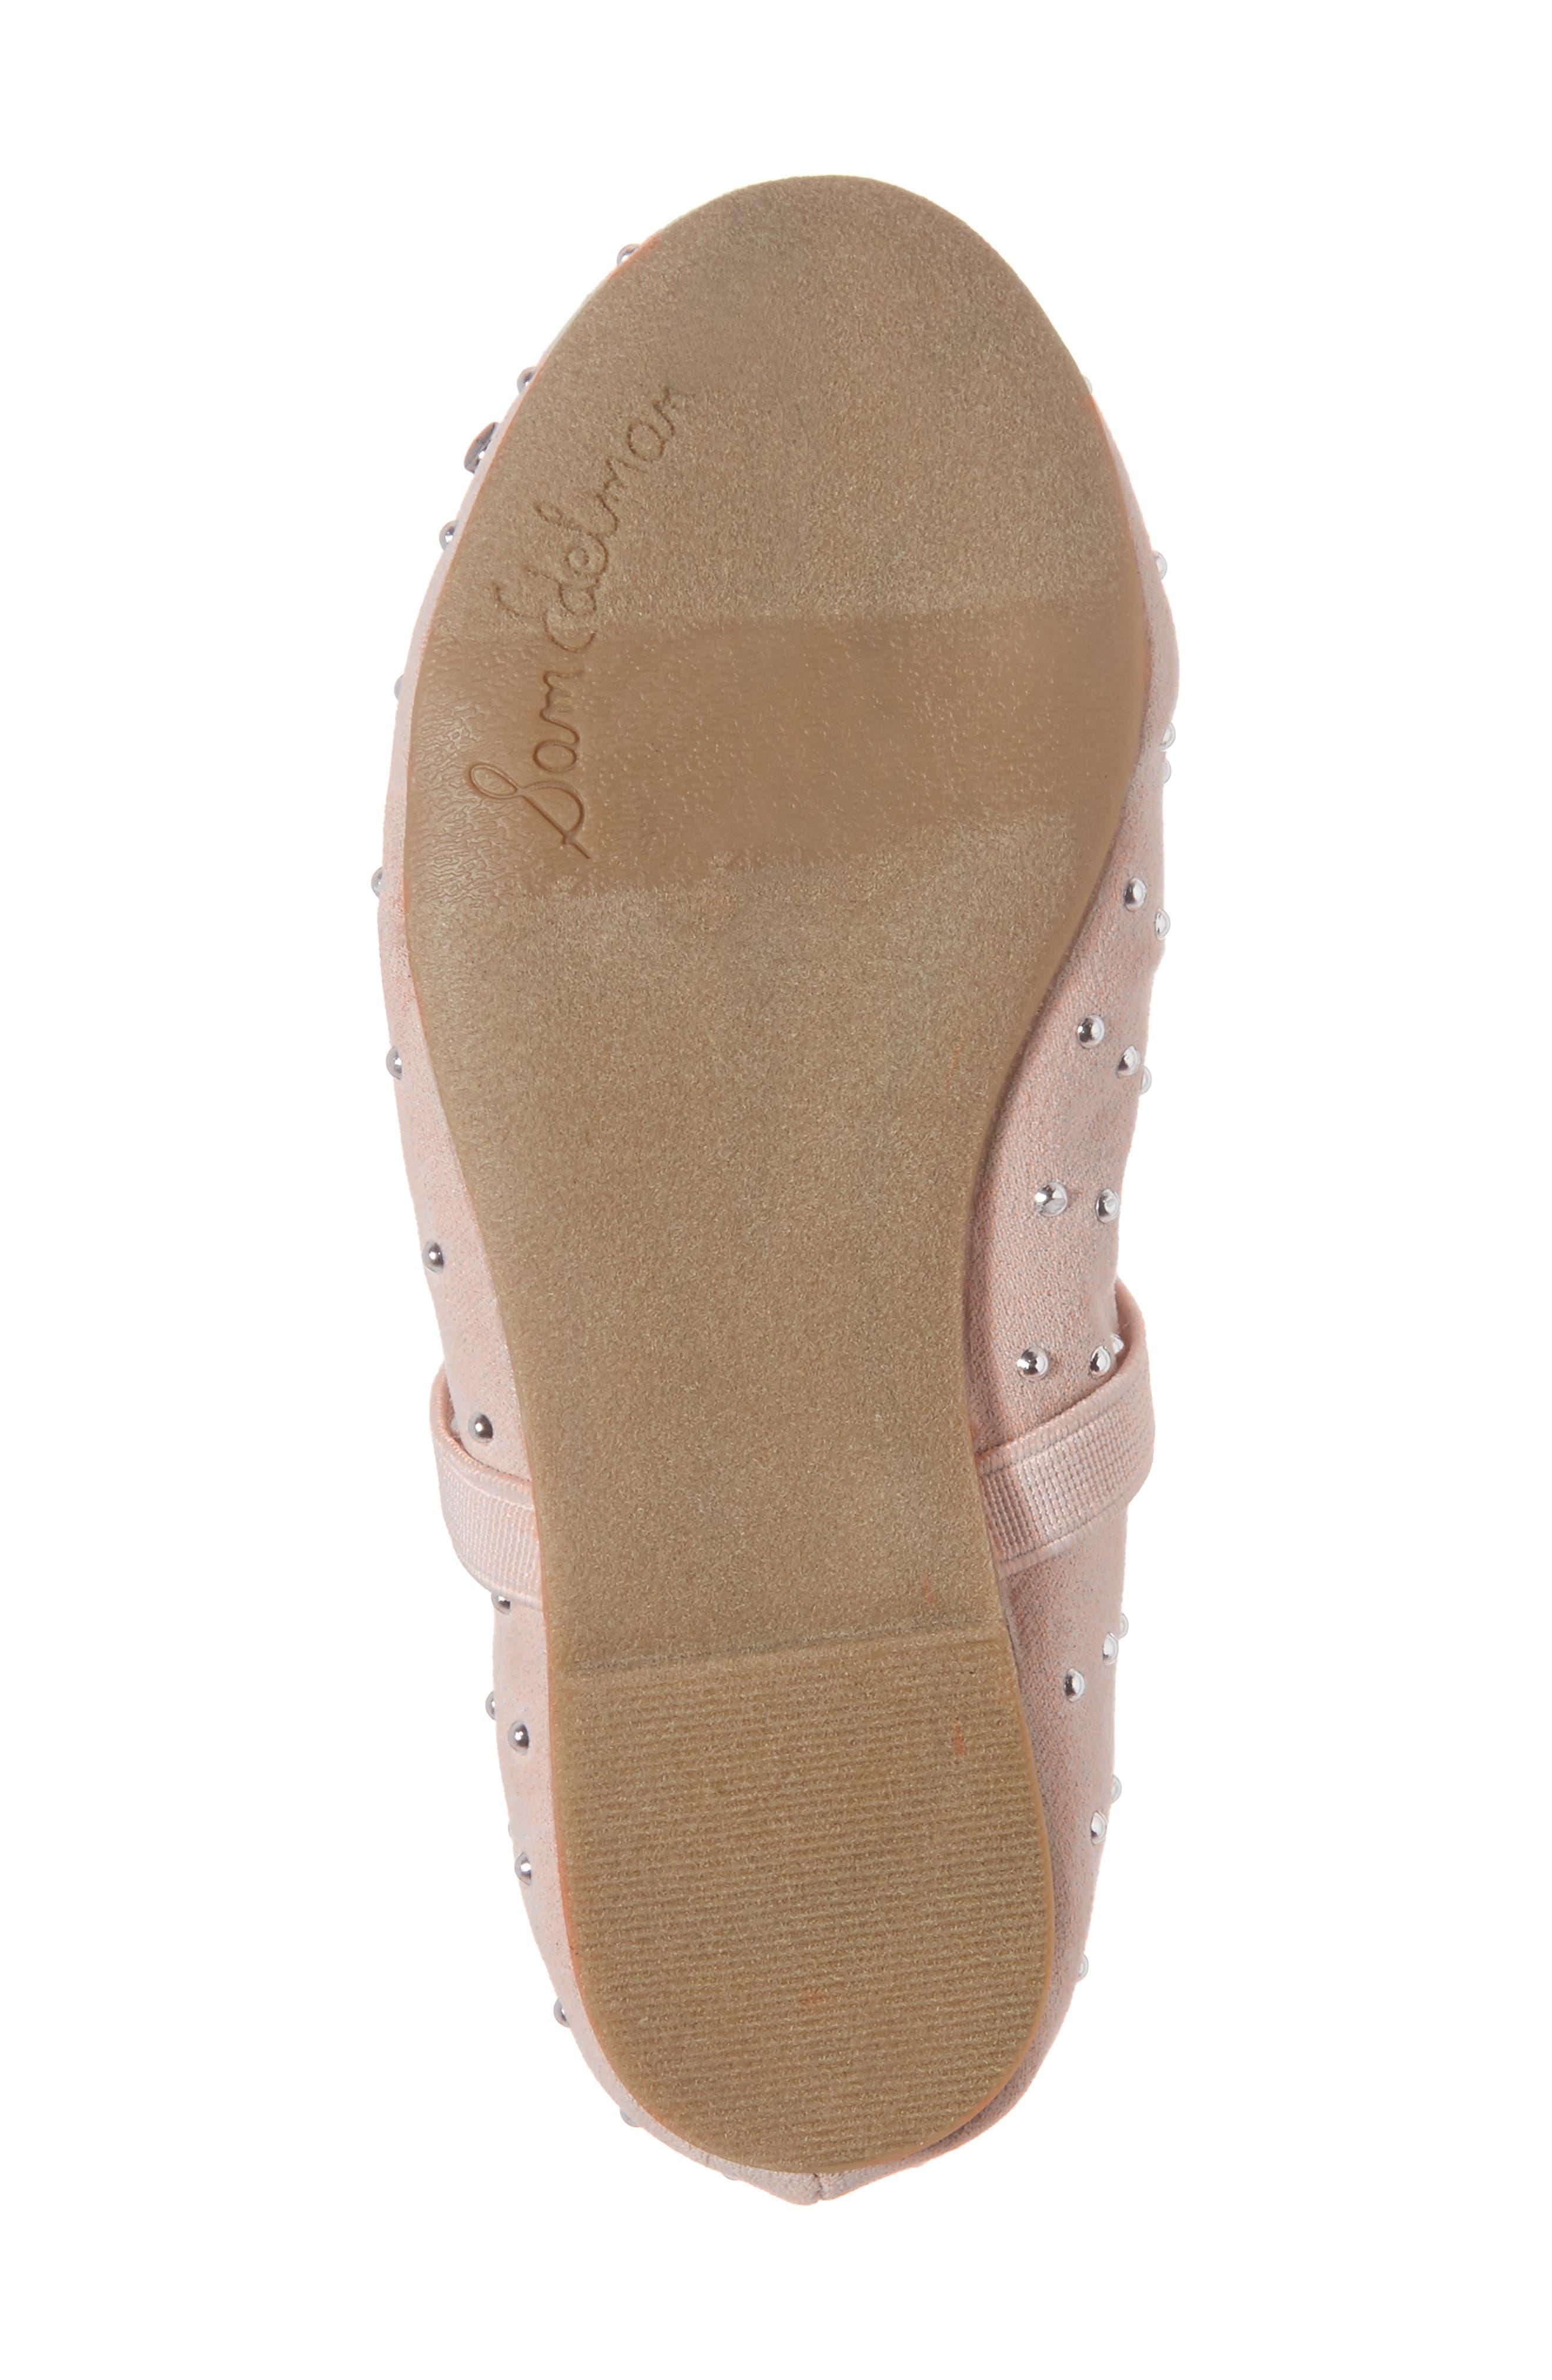 Felicia Ballet Flats,                             Alternate thumbnail 6, color,                             652